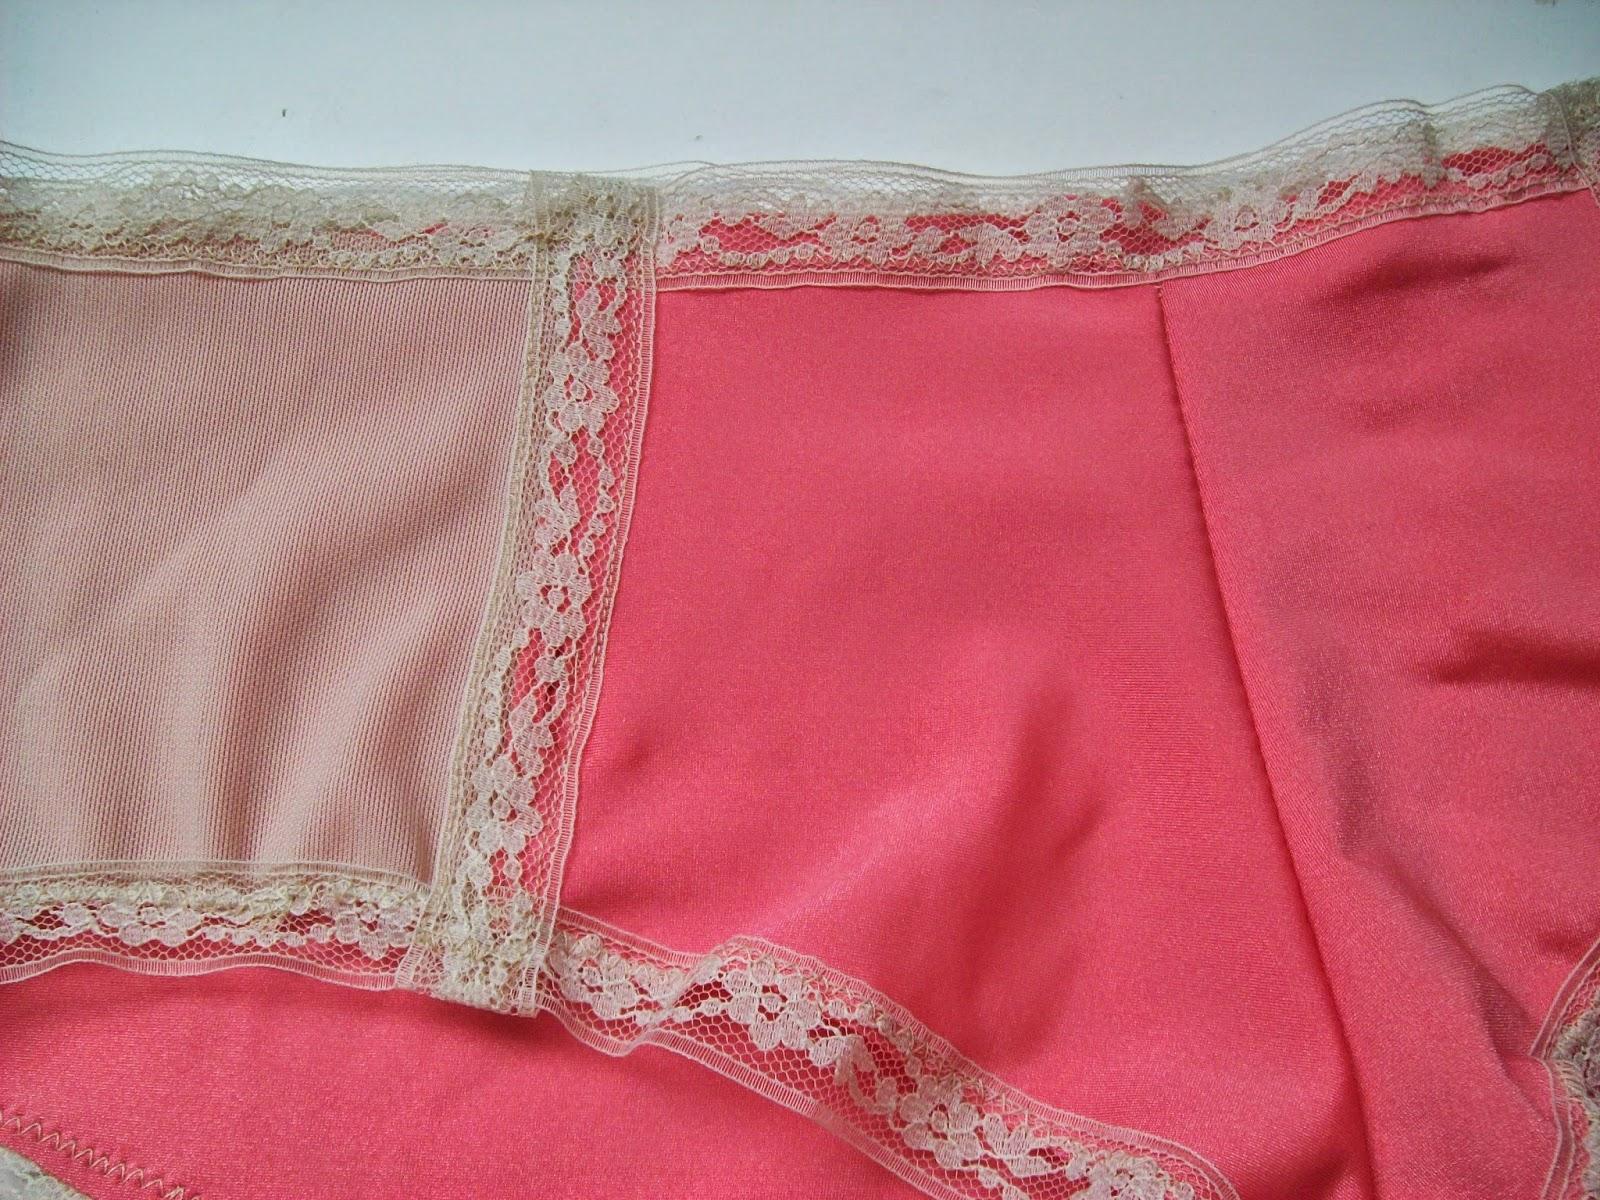 7c82d61142b Guild of Goods  Lingerie  Cloth Habit s Watson Bra   Bikini and Rosy ...